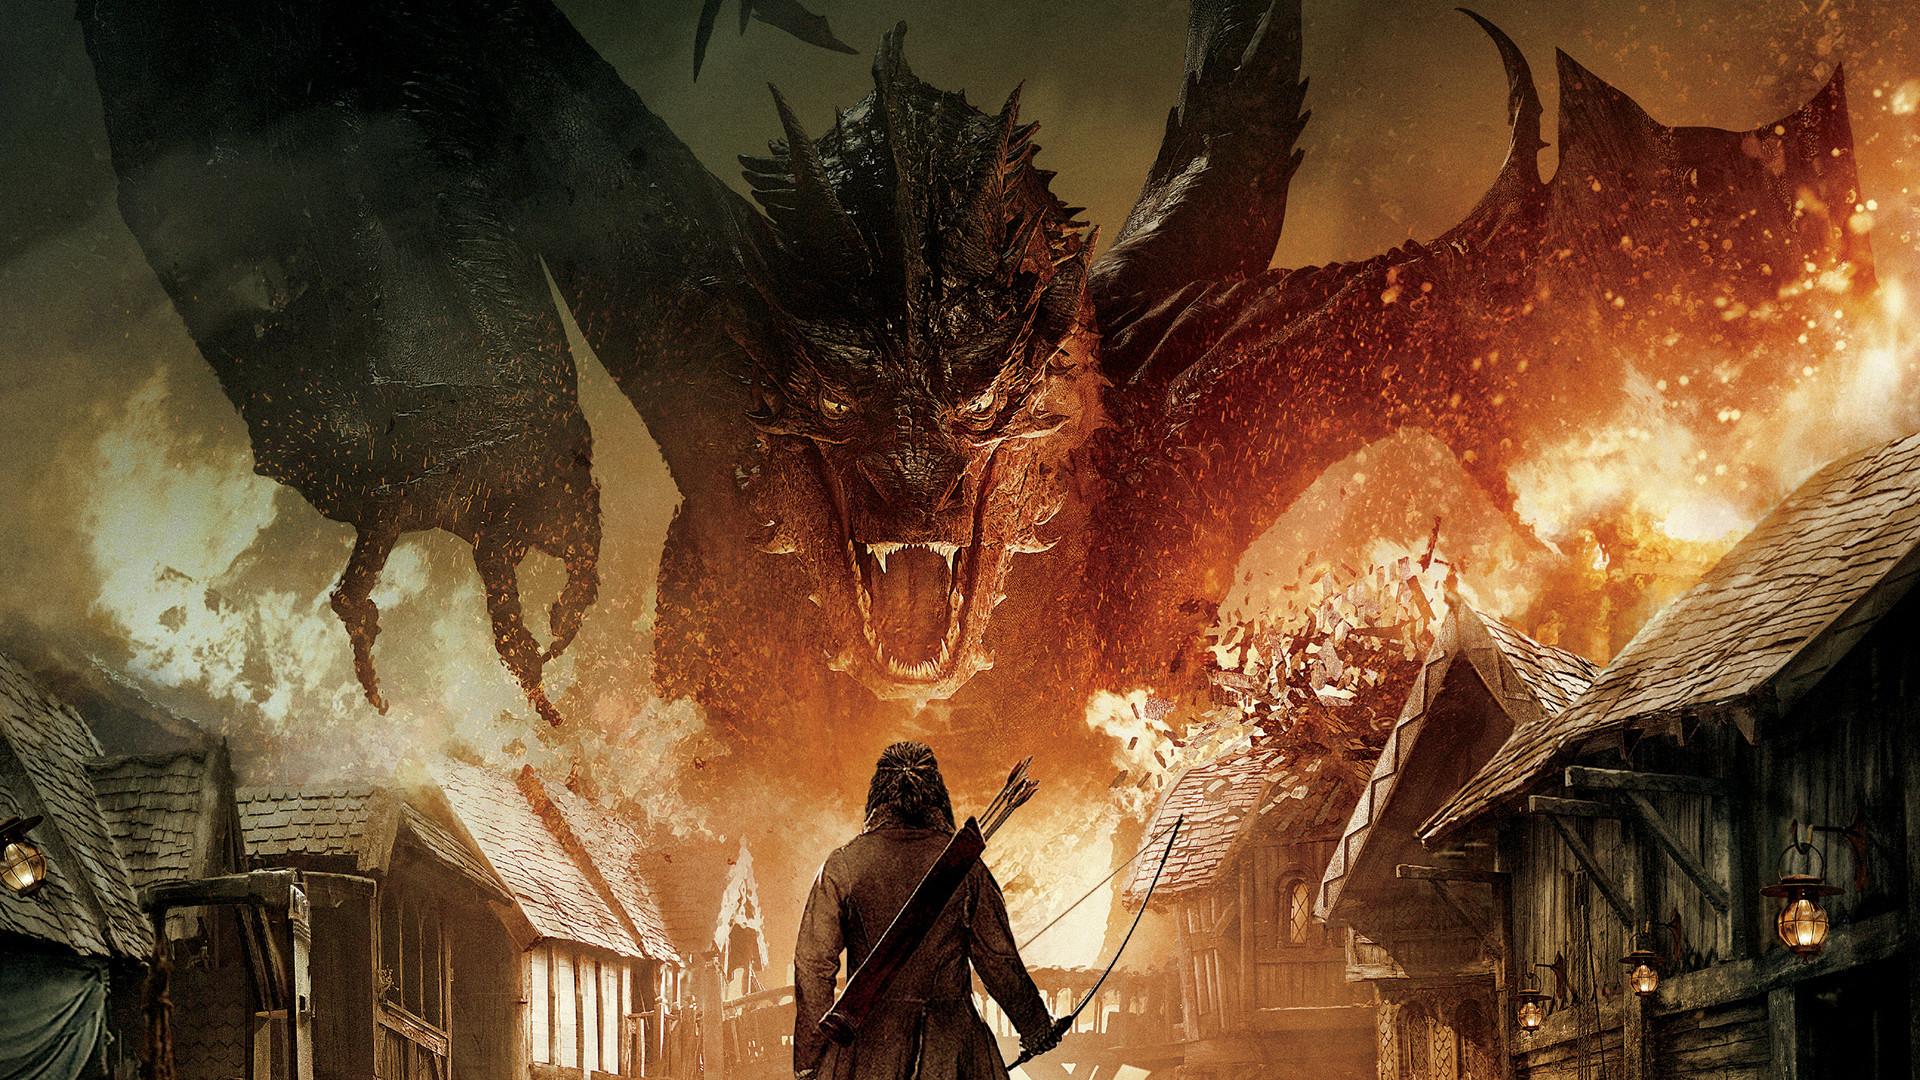 Hobbit Smaug Wallpaper